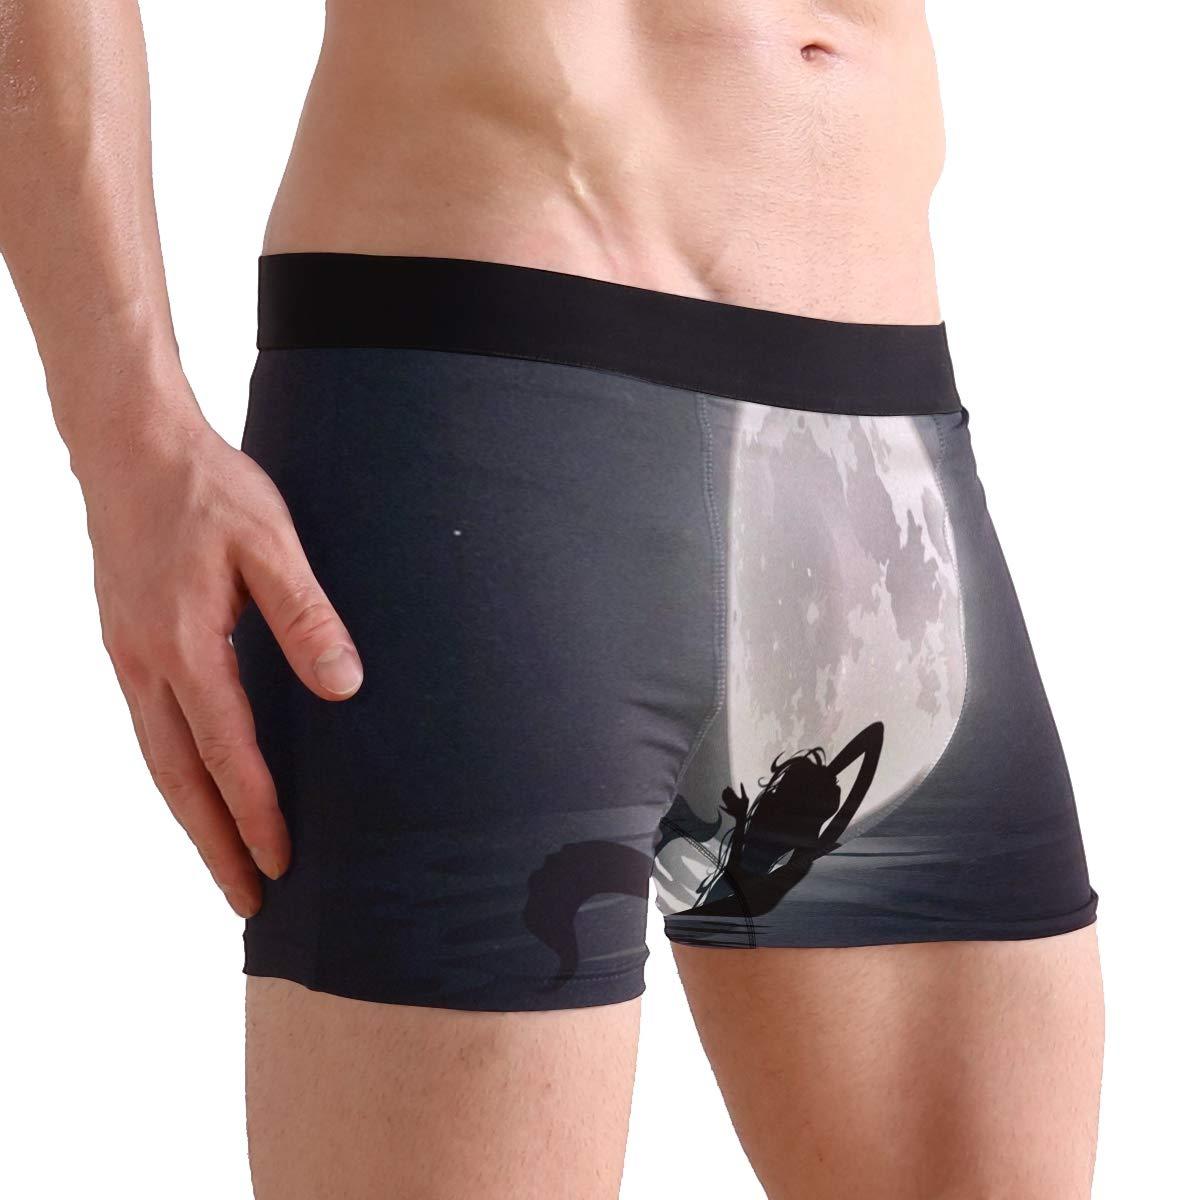 Mermaid Fairy Tale Boxer Briefs Mens Underwear Pack Seamless Comfort Soft